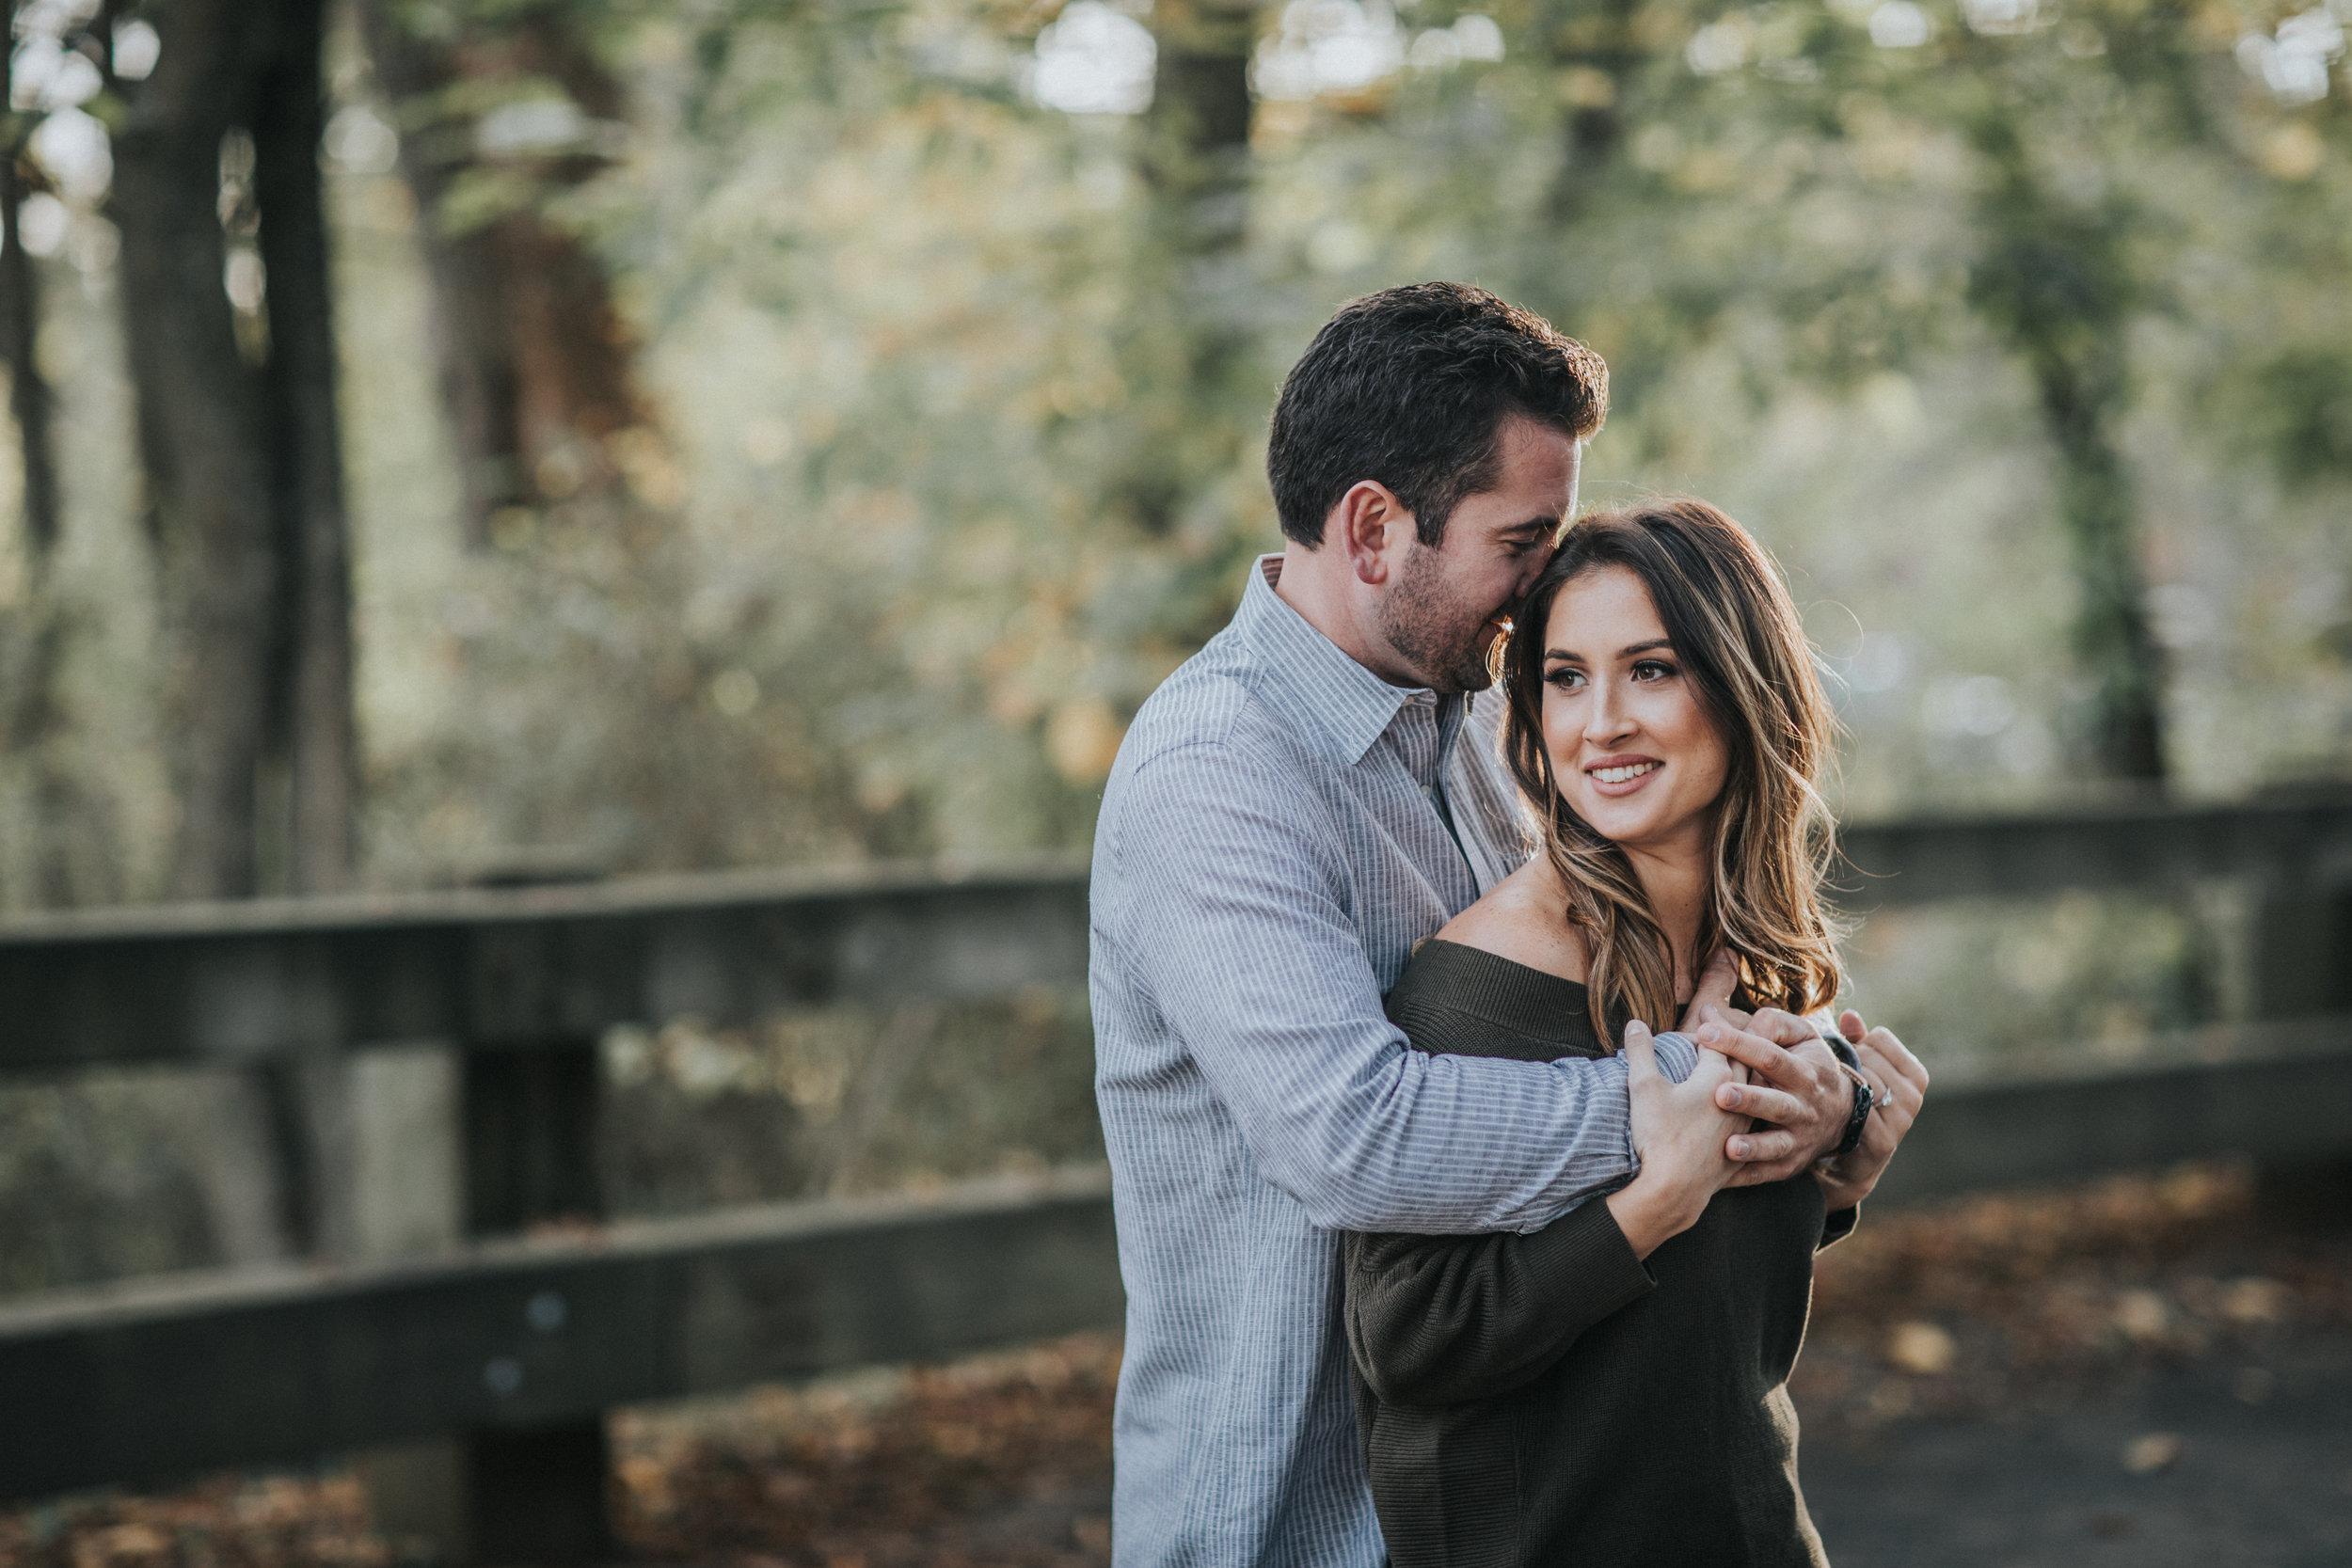 New-Jersey-Wedding-Photographer-Smithville-Engagement-Erika-Chris-11.jpg